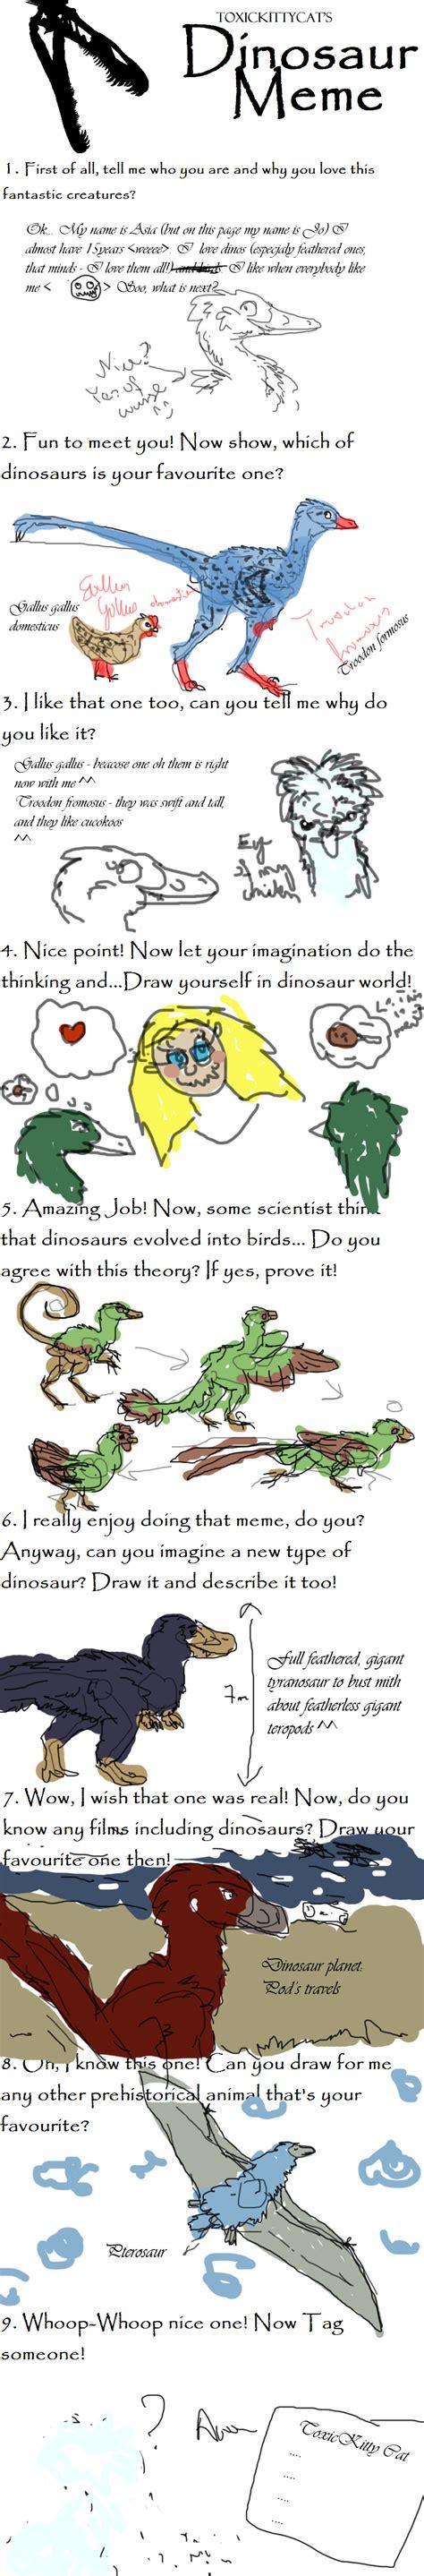 Dinosaur Memes - dinosaur meme by bluefluffydinosaur on deviantart